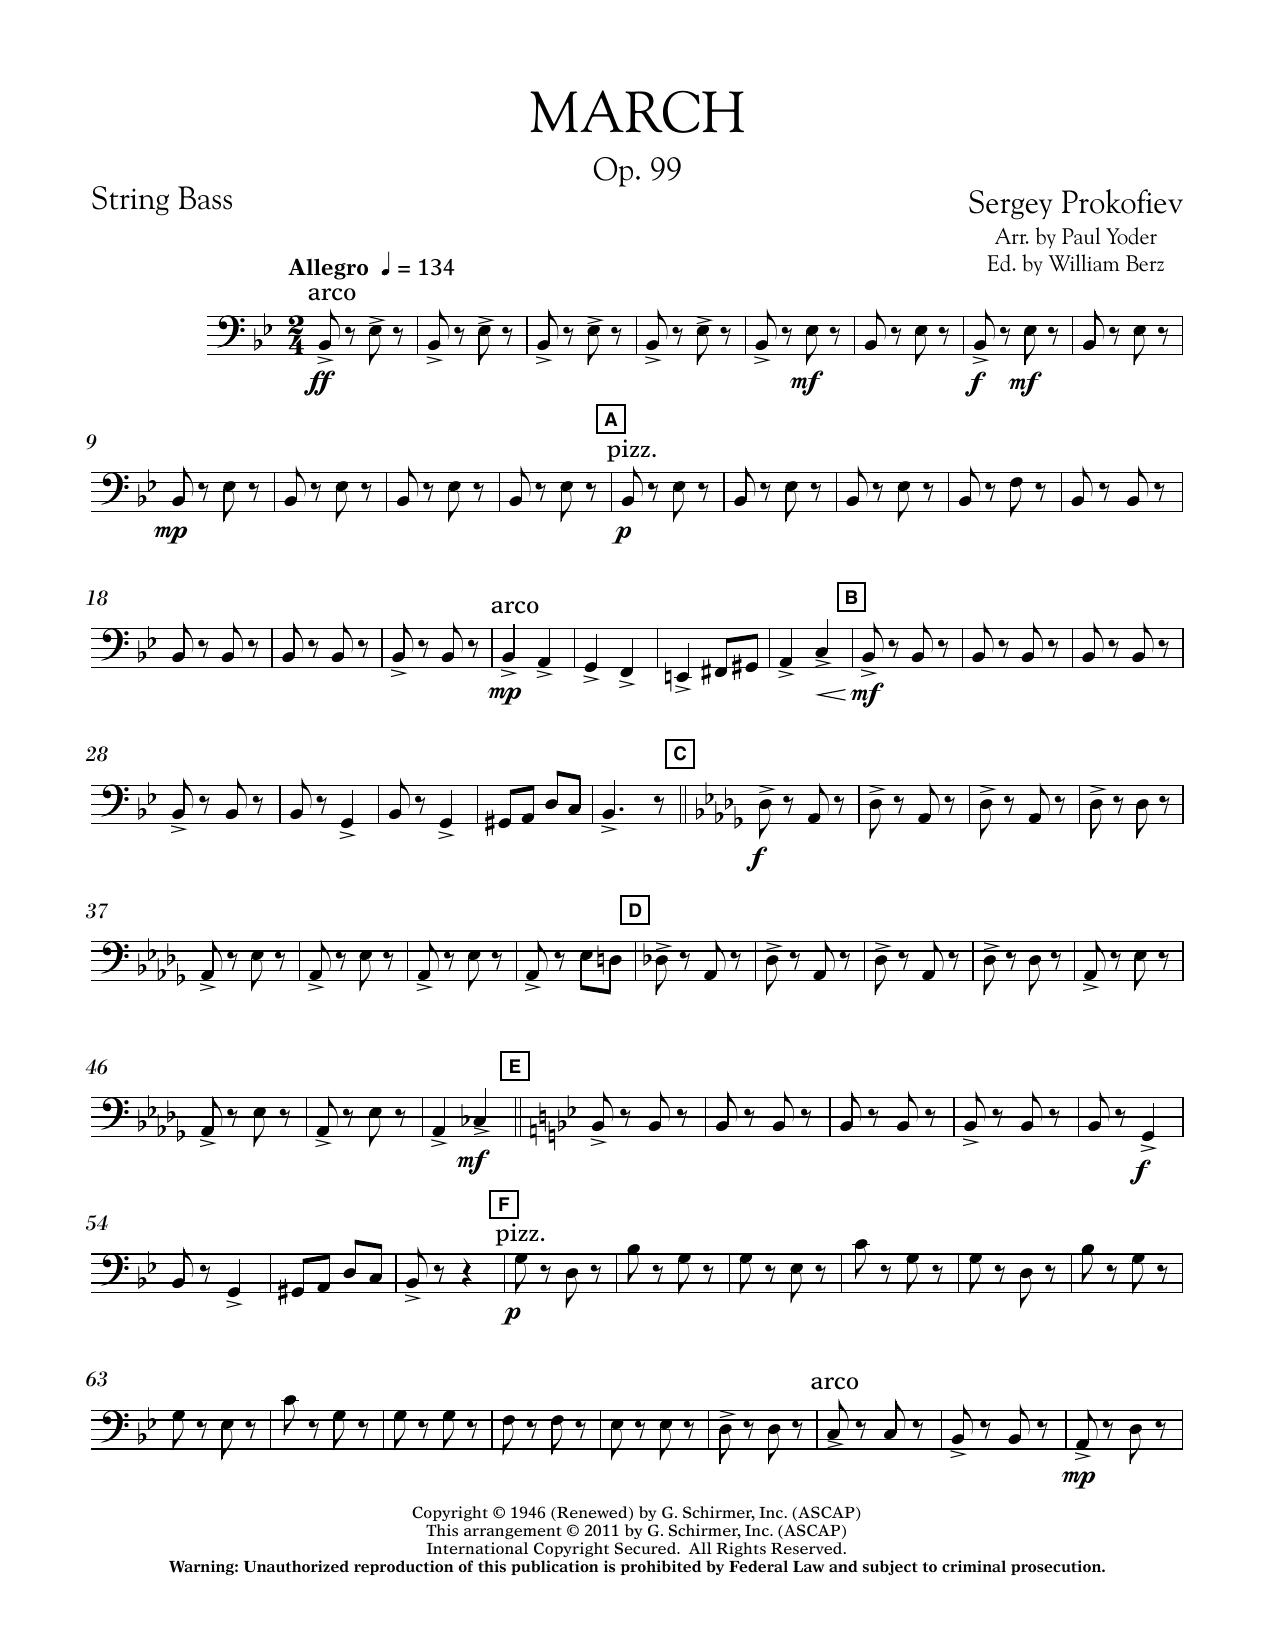 Paul Yoder March, Op. 99 - String Bass sheet music notes printable PDF score